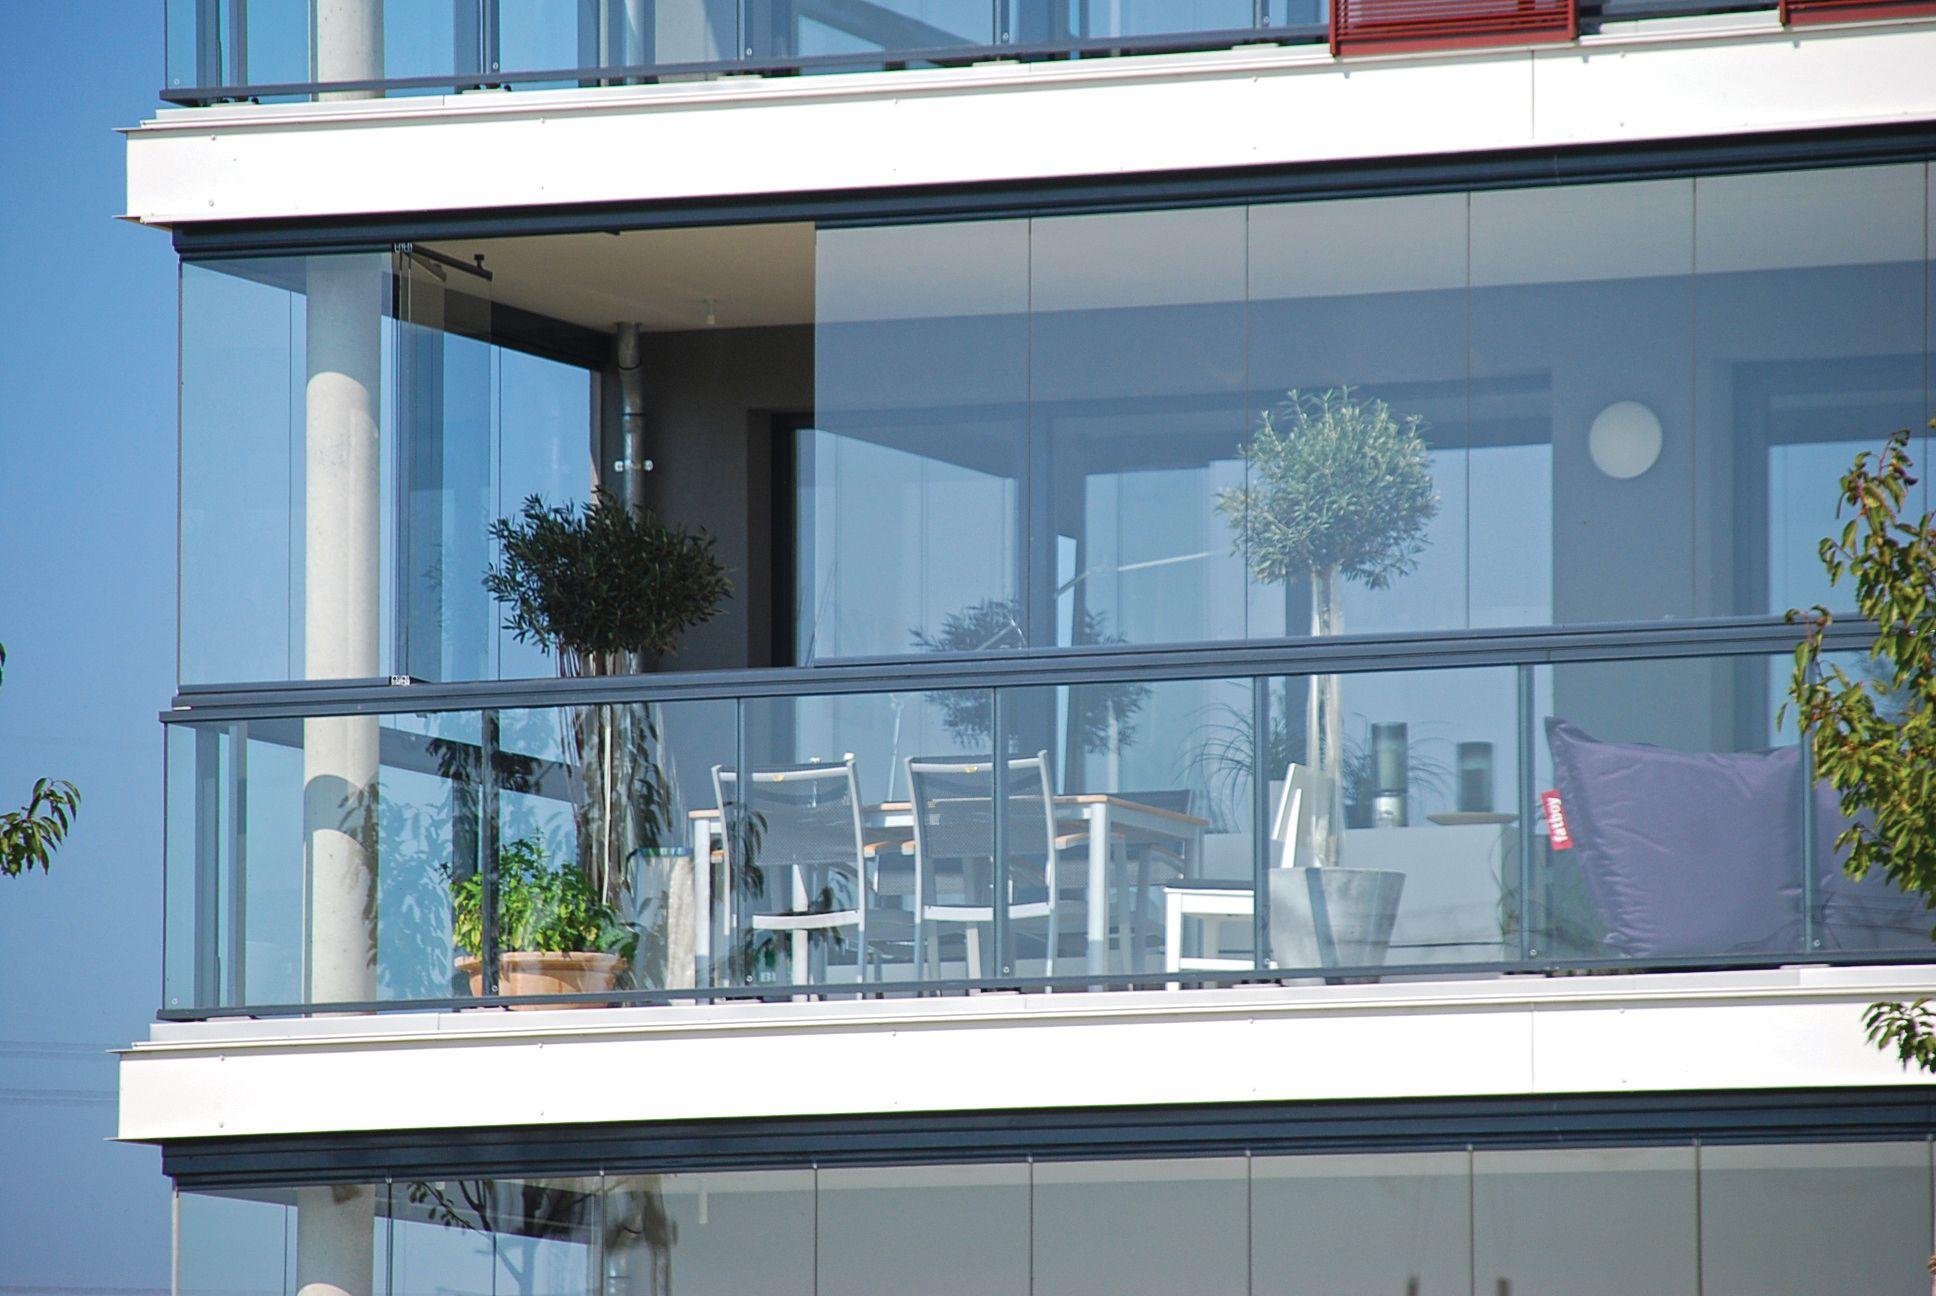 Terraza acristalada barandilla m s cortina de cristal - Cortina para terraza ...